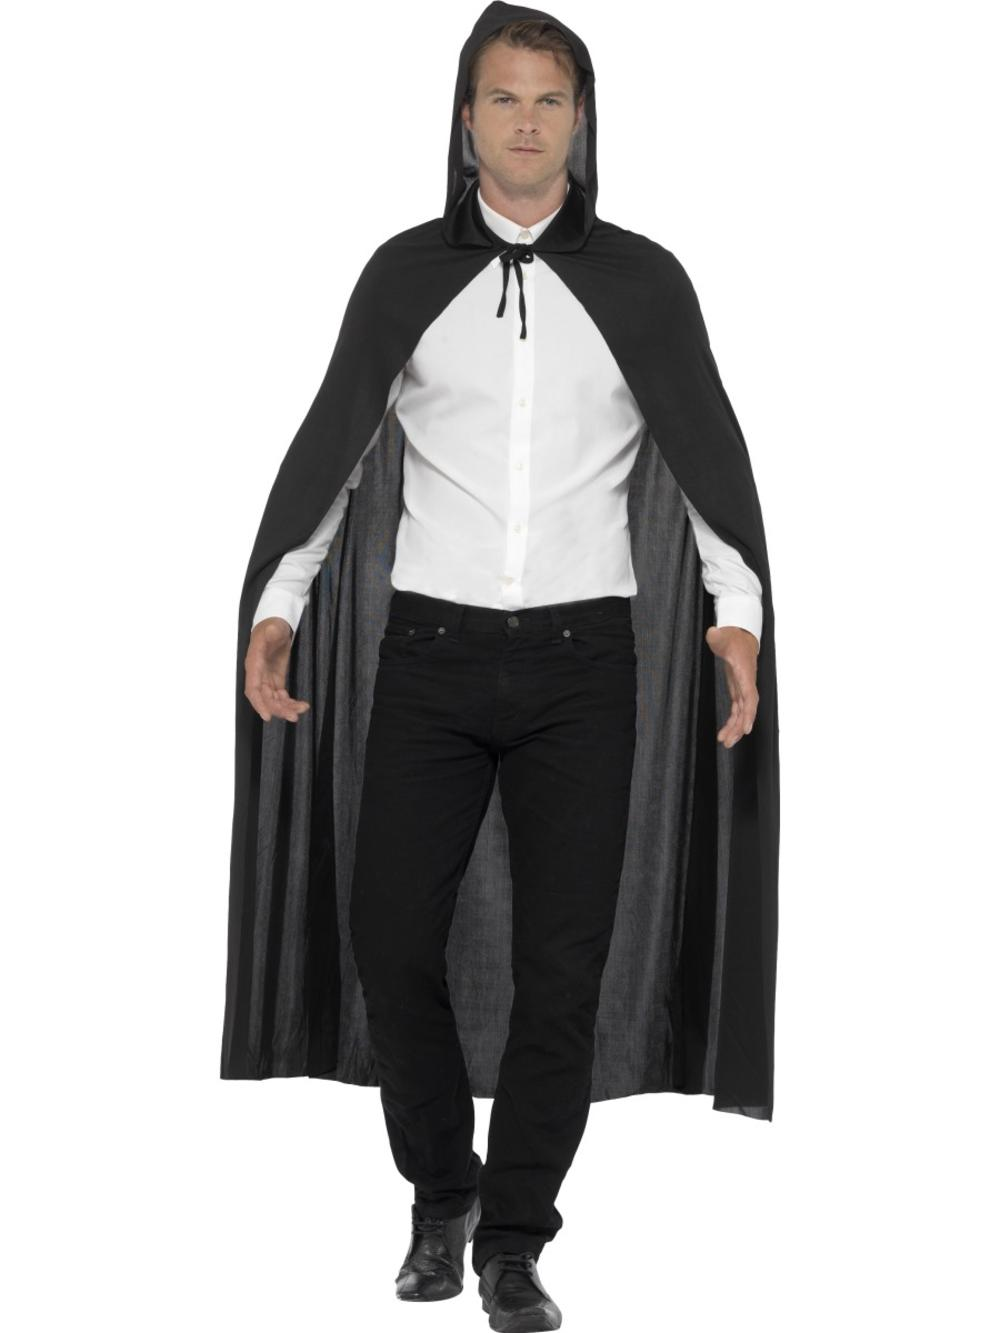 Hooded Vampire Cape Costume Accessory